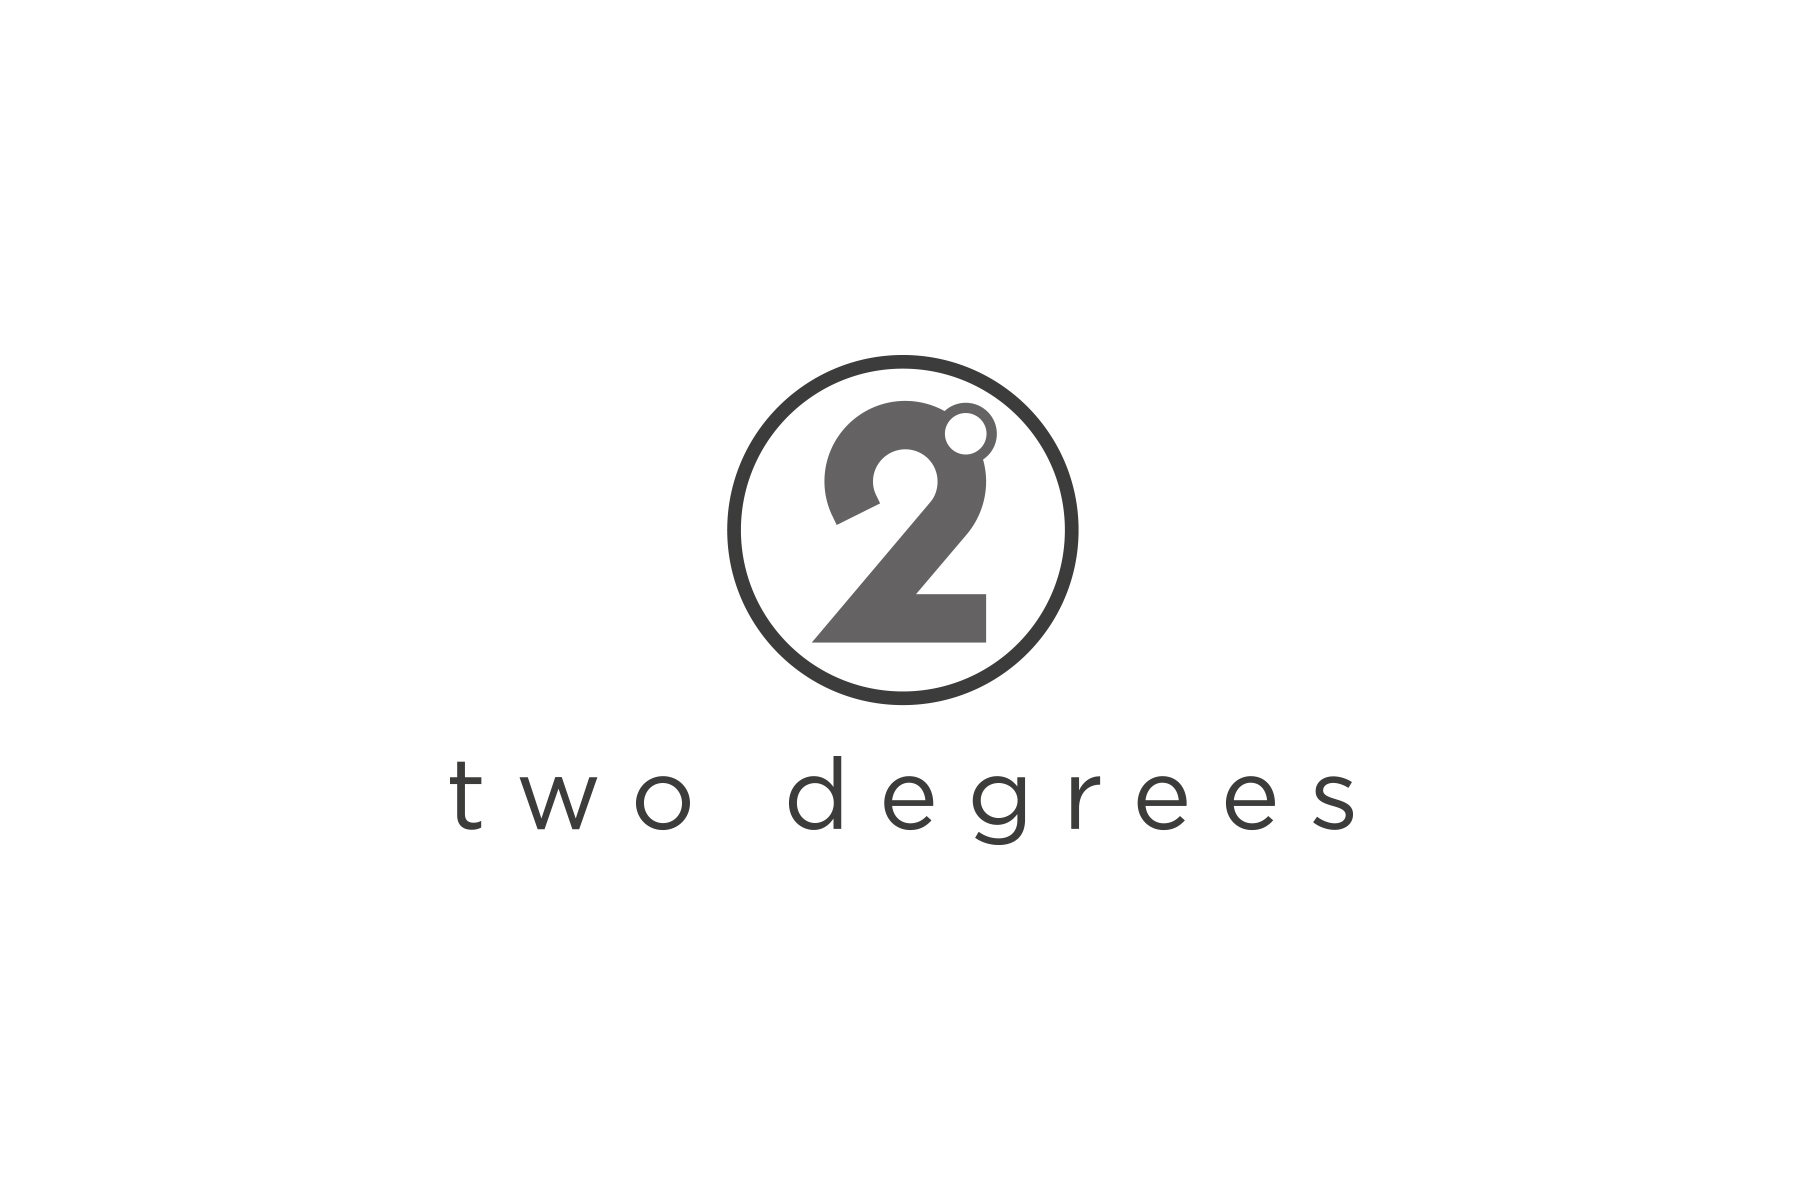 Logos_6x4_2Degrees.jpg